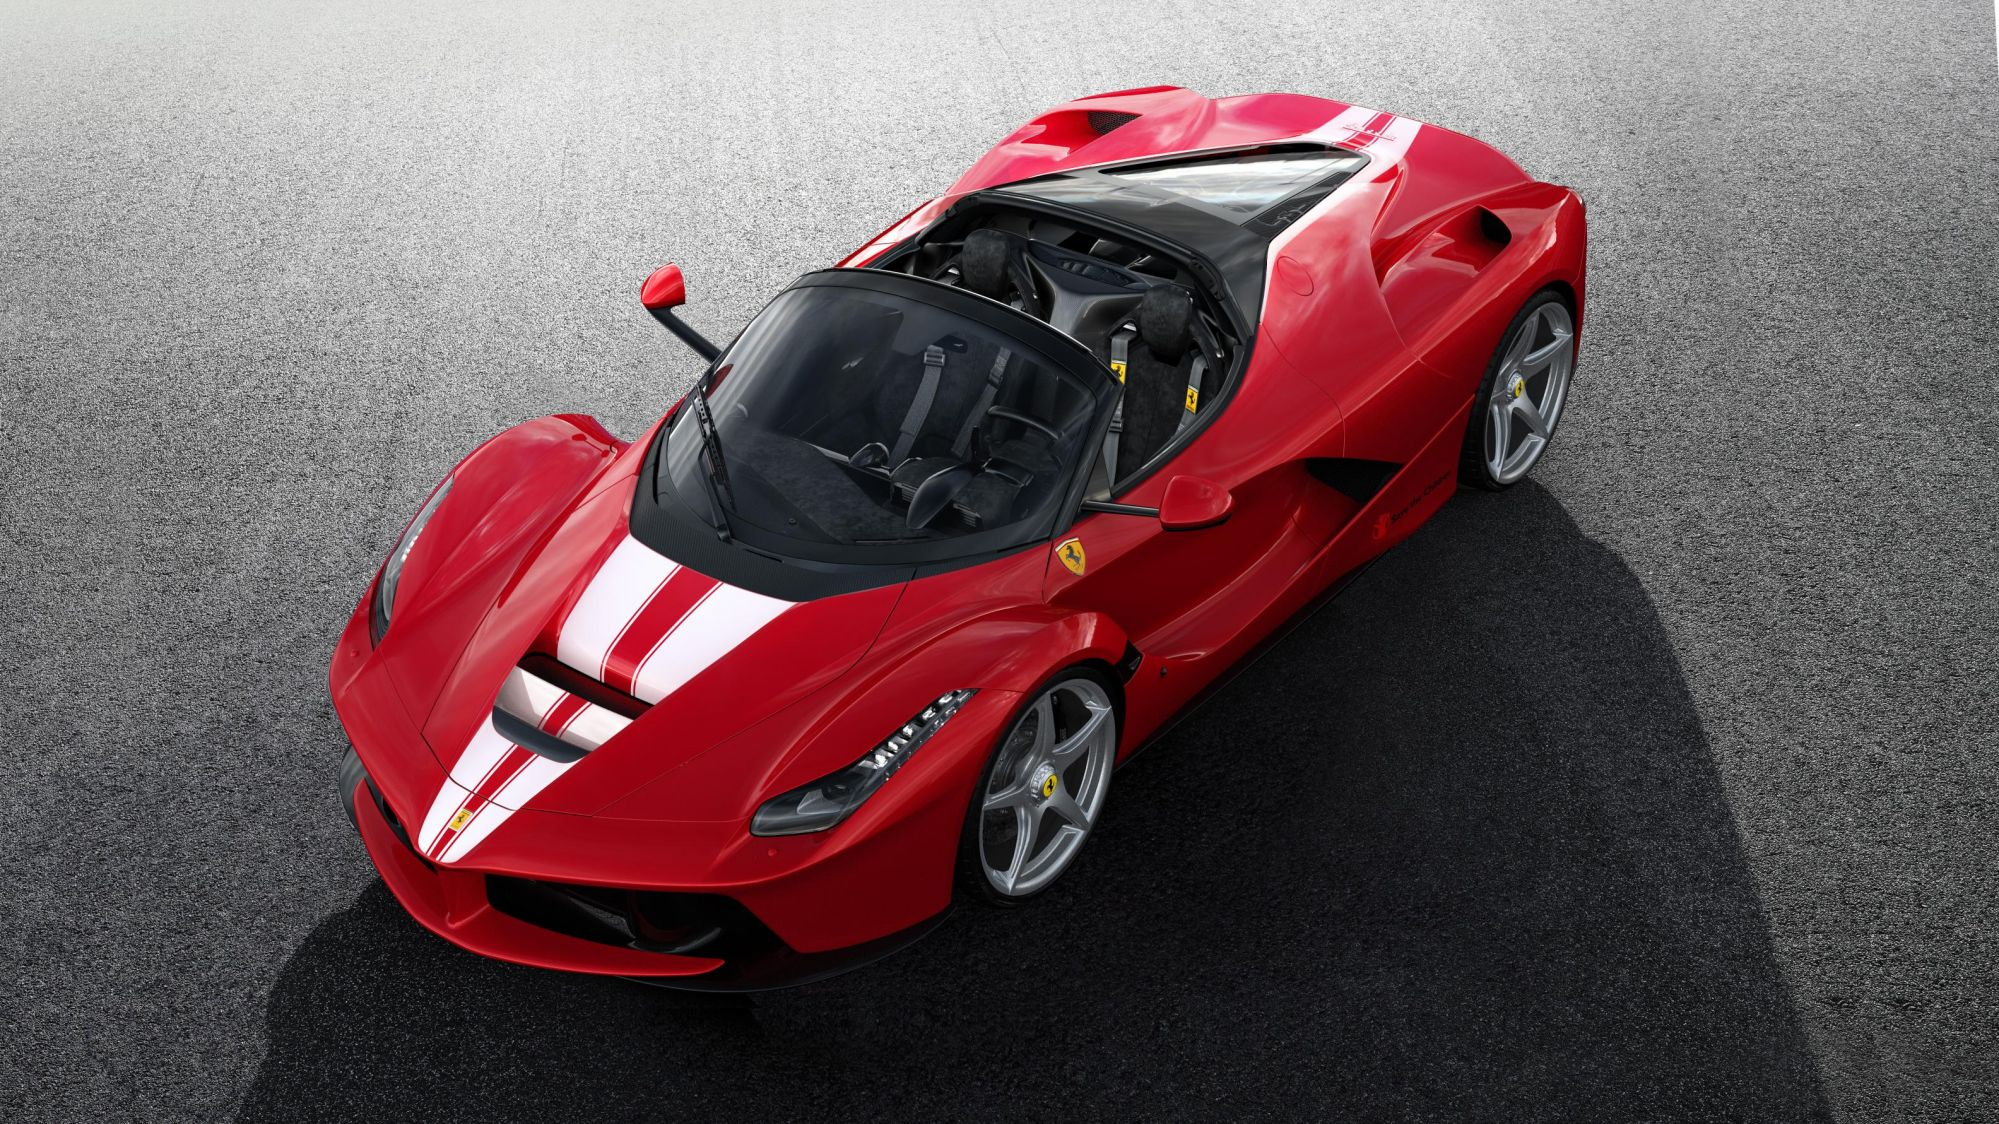 This Ferrari LaFerrari Aperta Will Be Auctioned For Charity